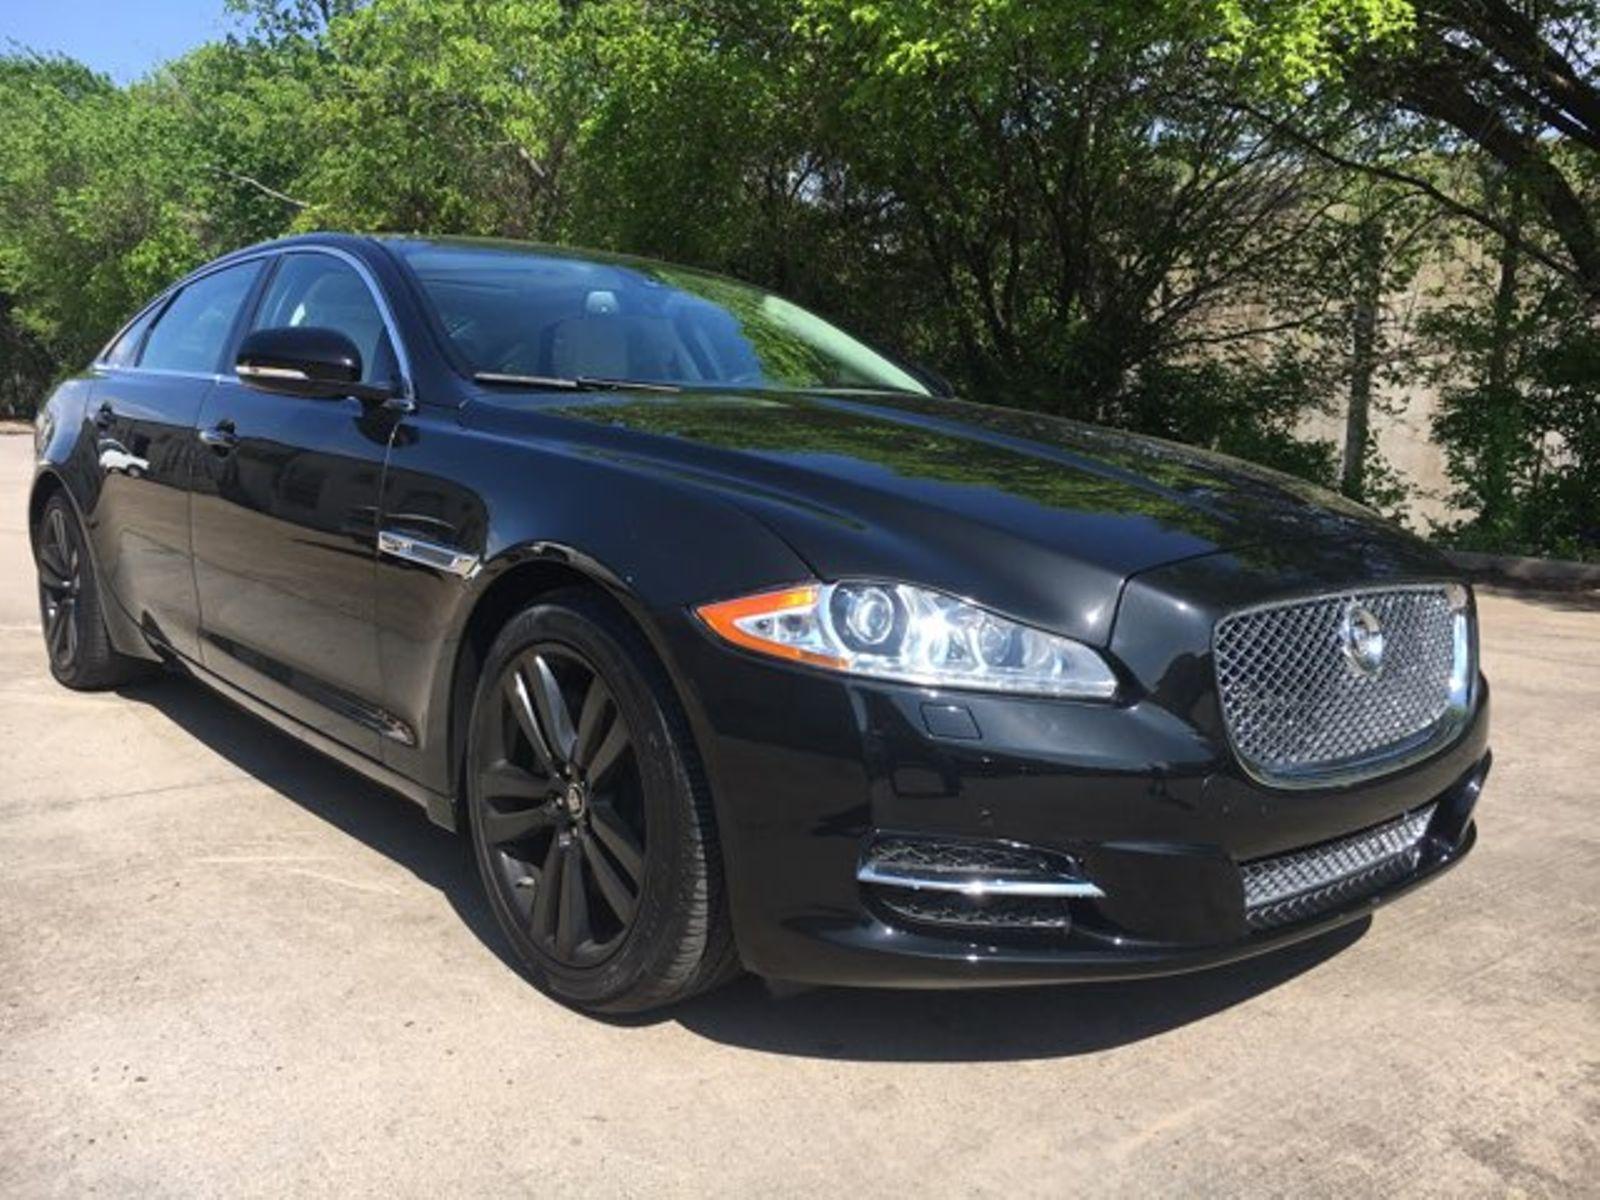 for texas picture large c listings of classiccars sale replica com kit dallas jaguar std view cc car in